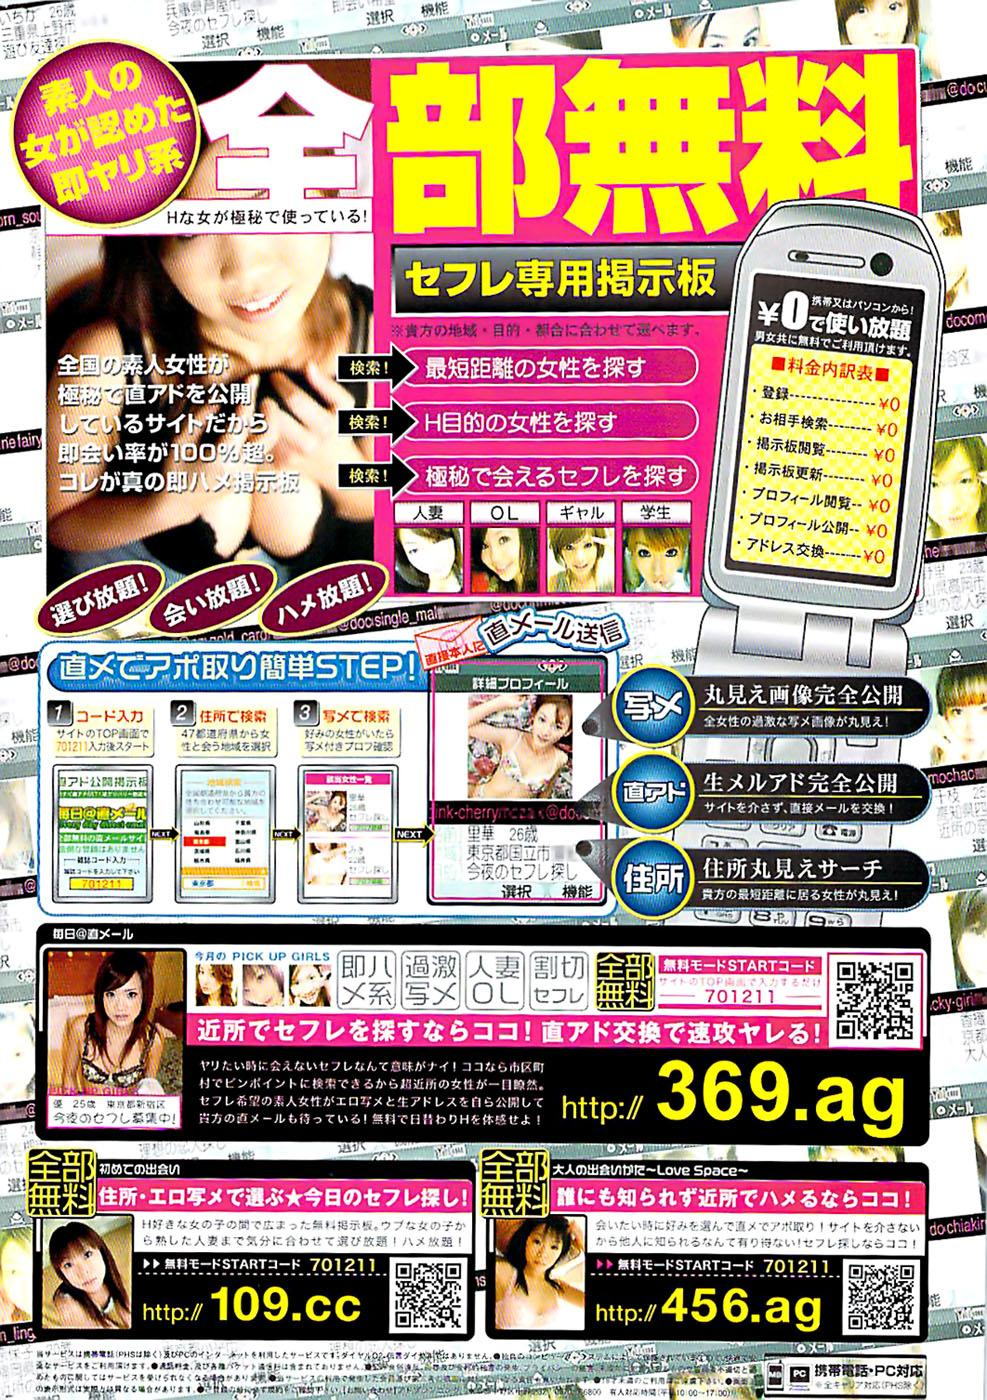 COMIC CanDoll 2007-03 Vol. 38 267